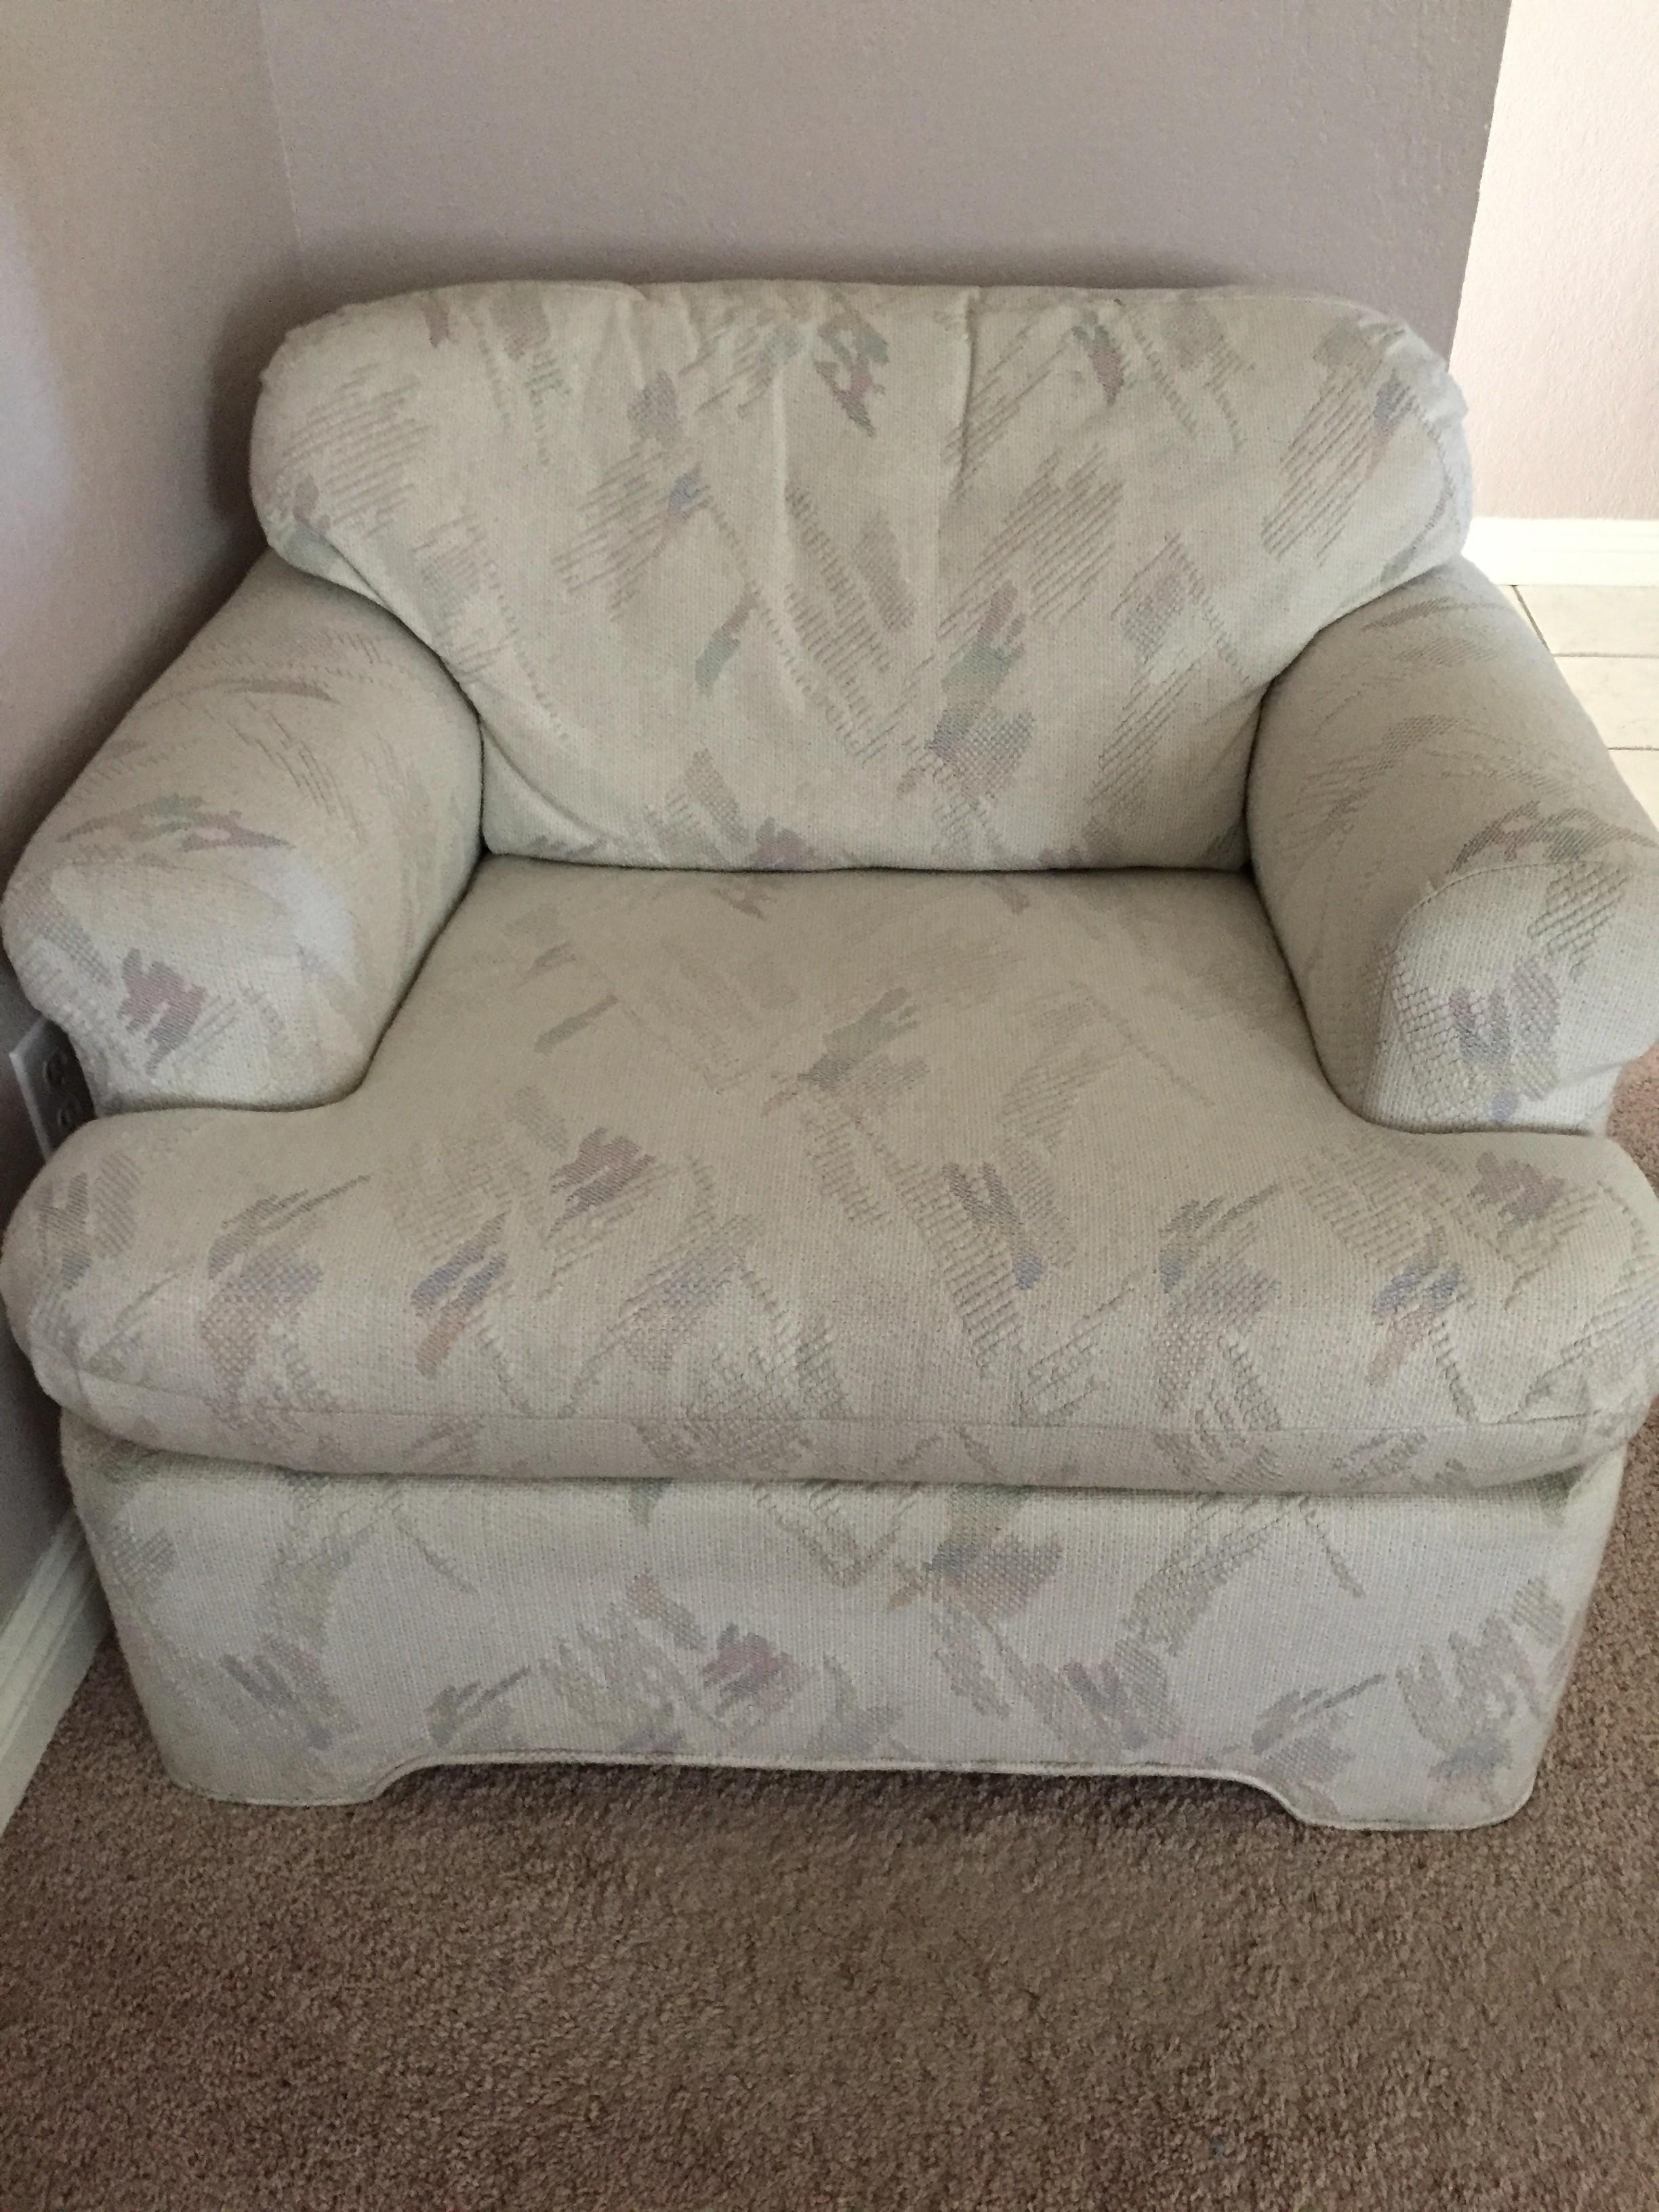 Groovy Sectional Sofa With Big Chair Southwestern Style Diggerslist Creativecarmelina Interior Chair Design Creativecarmelinacom